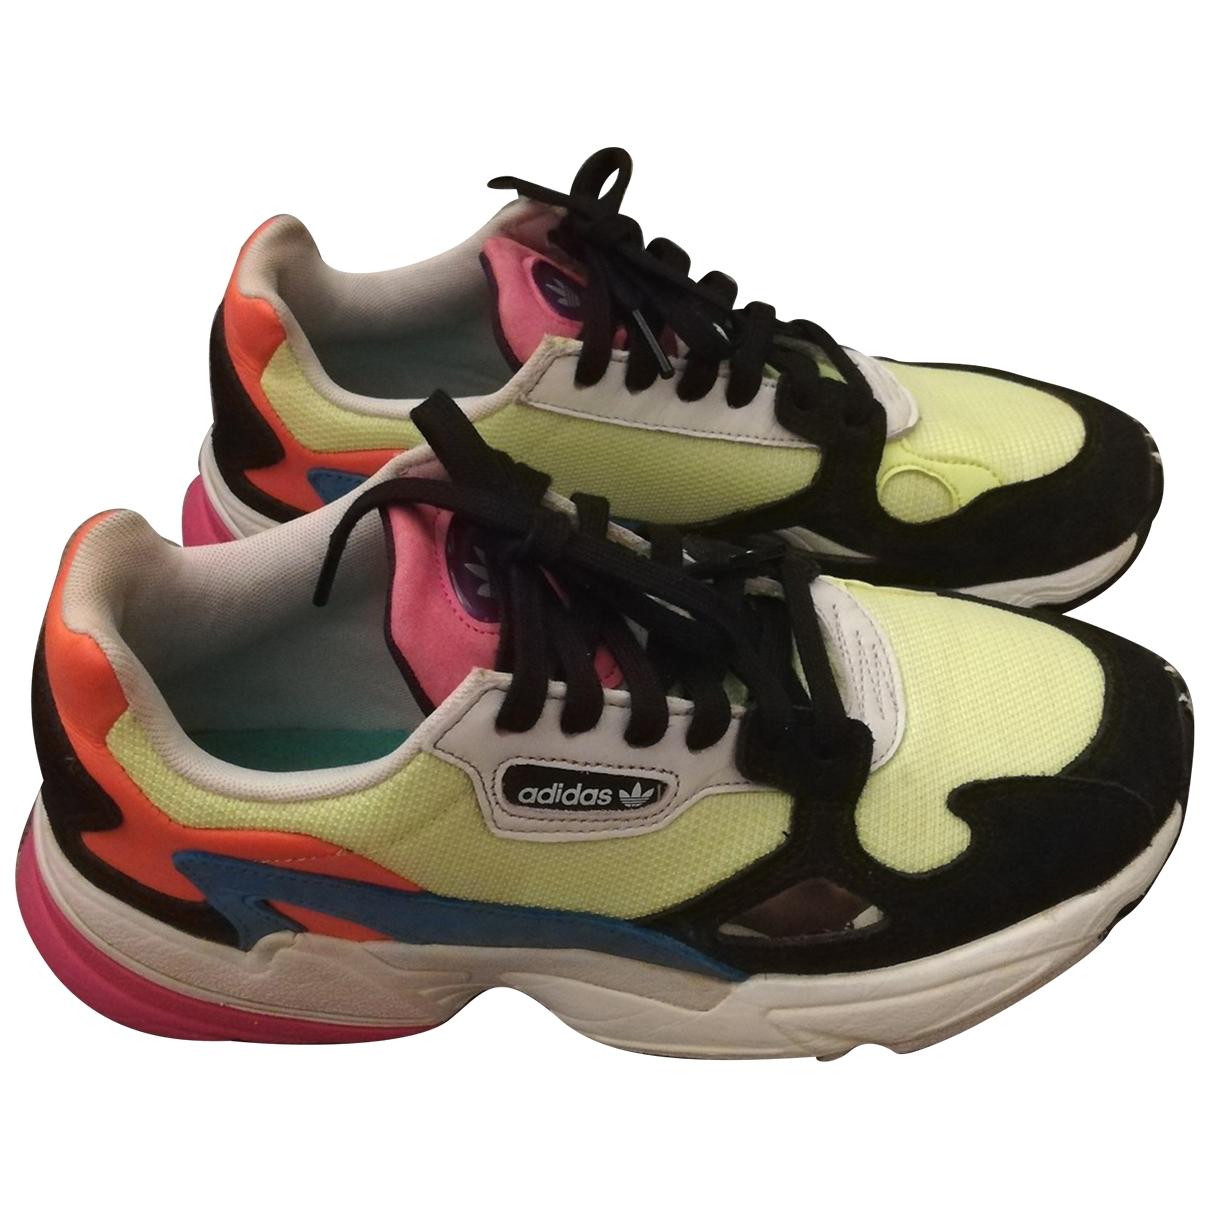 Adidas Falcon Sneakers in  Bunt Leinen